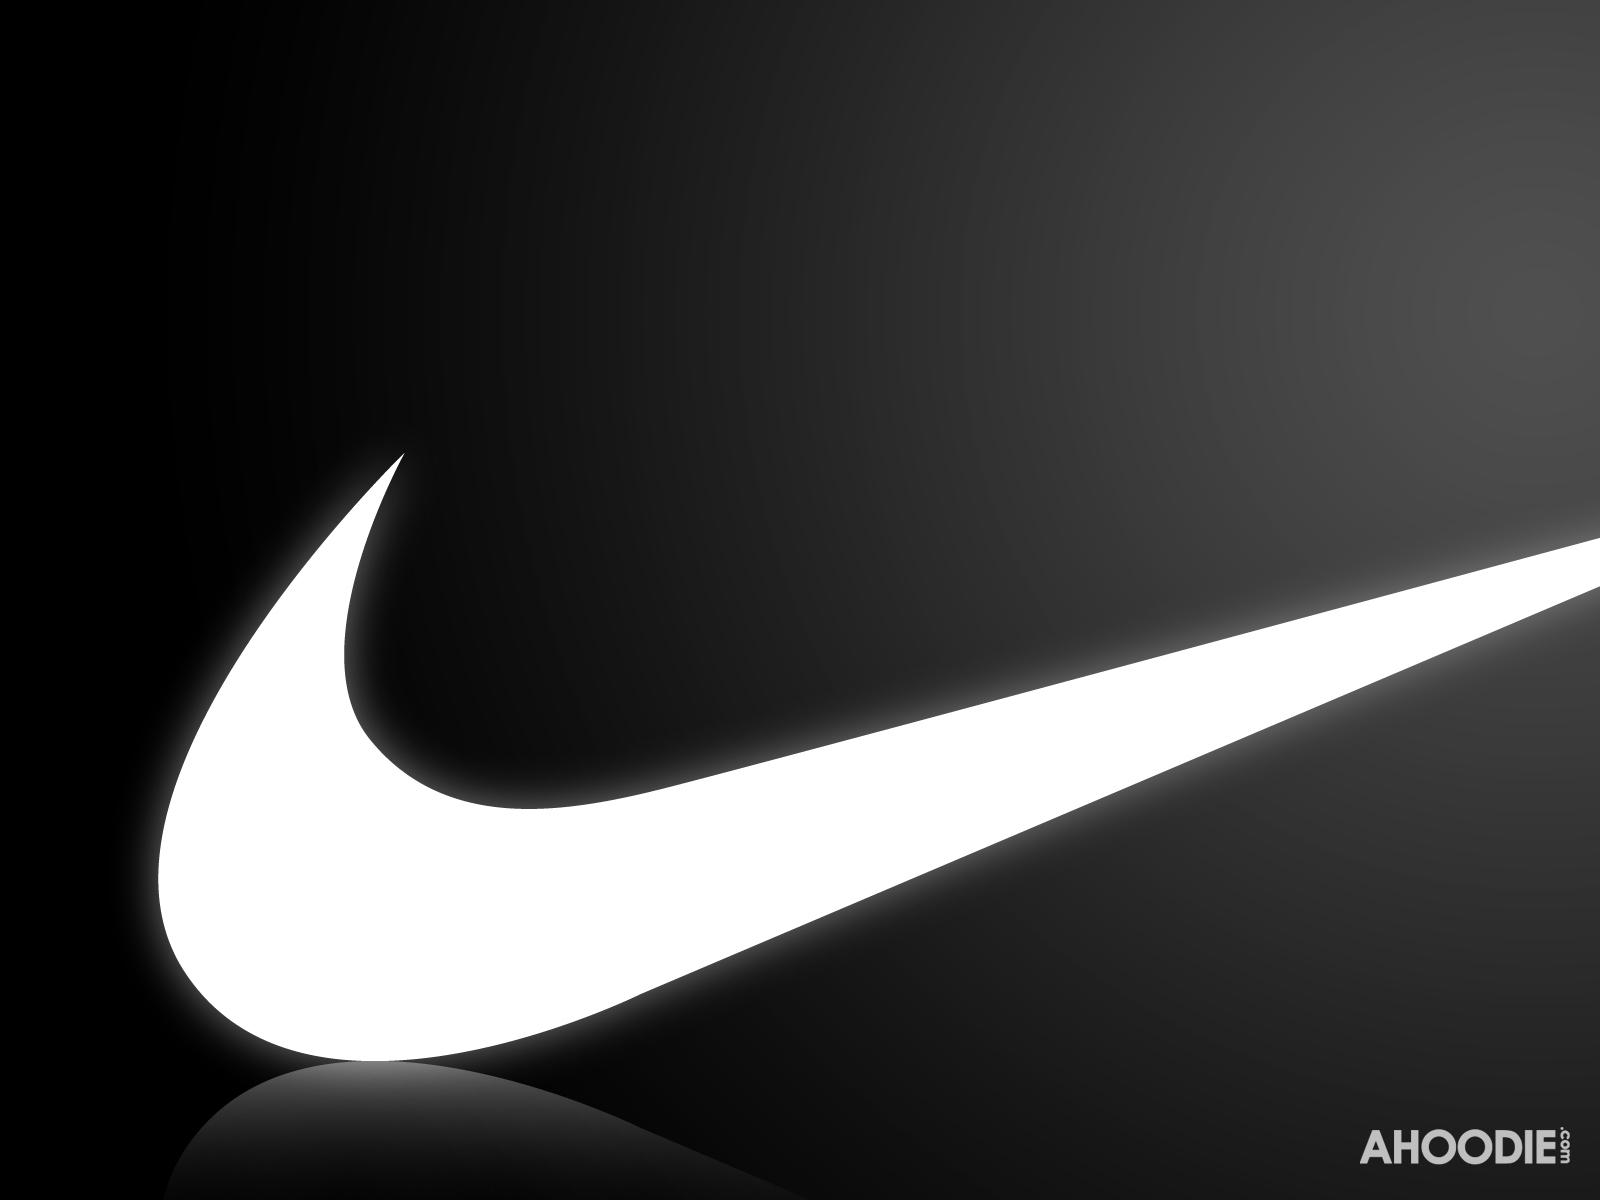 Nike Symbol Wallpapers 1600x1200